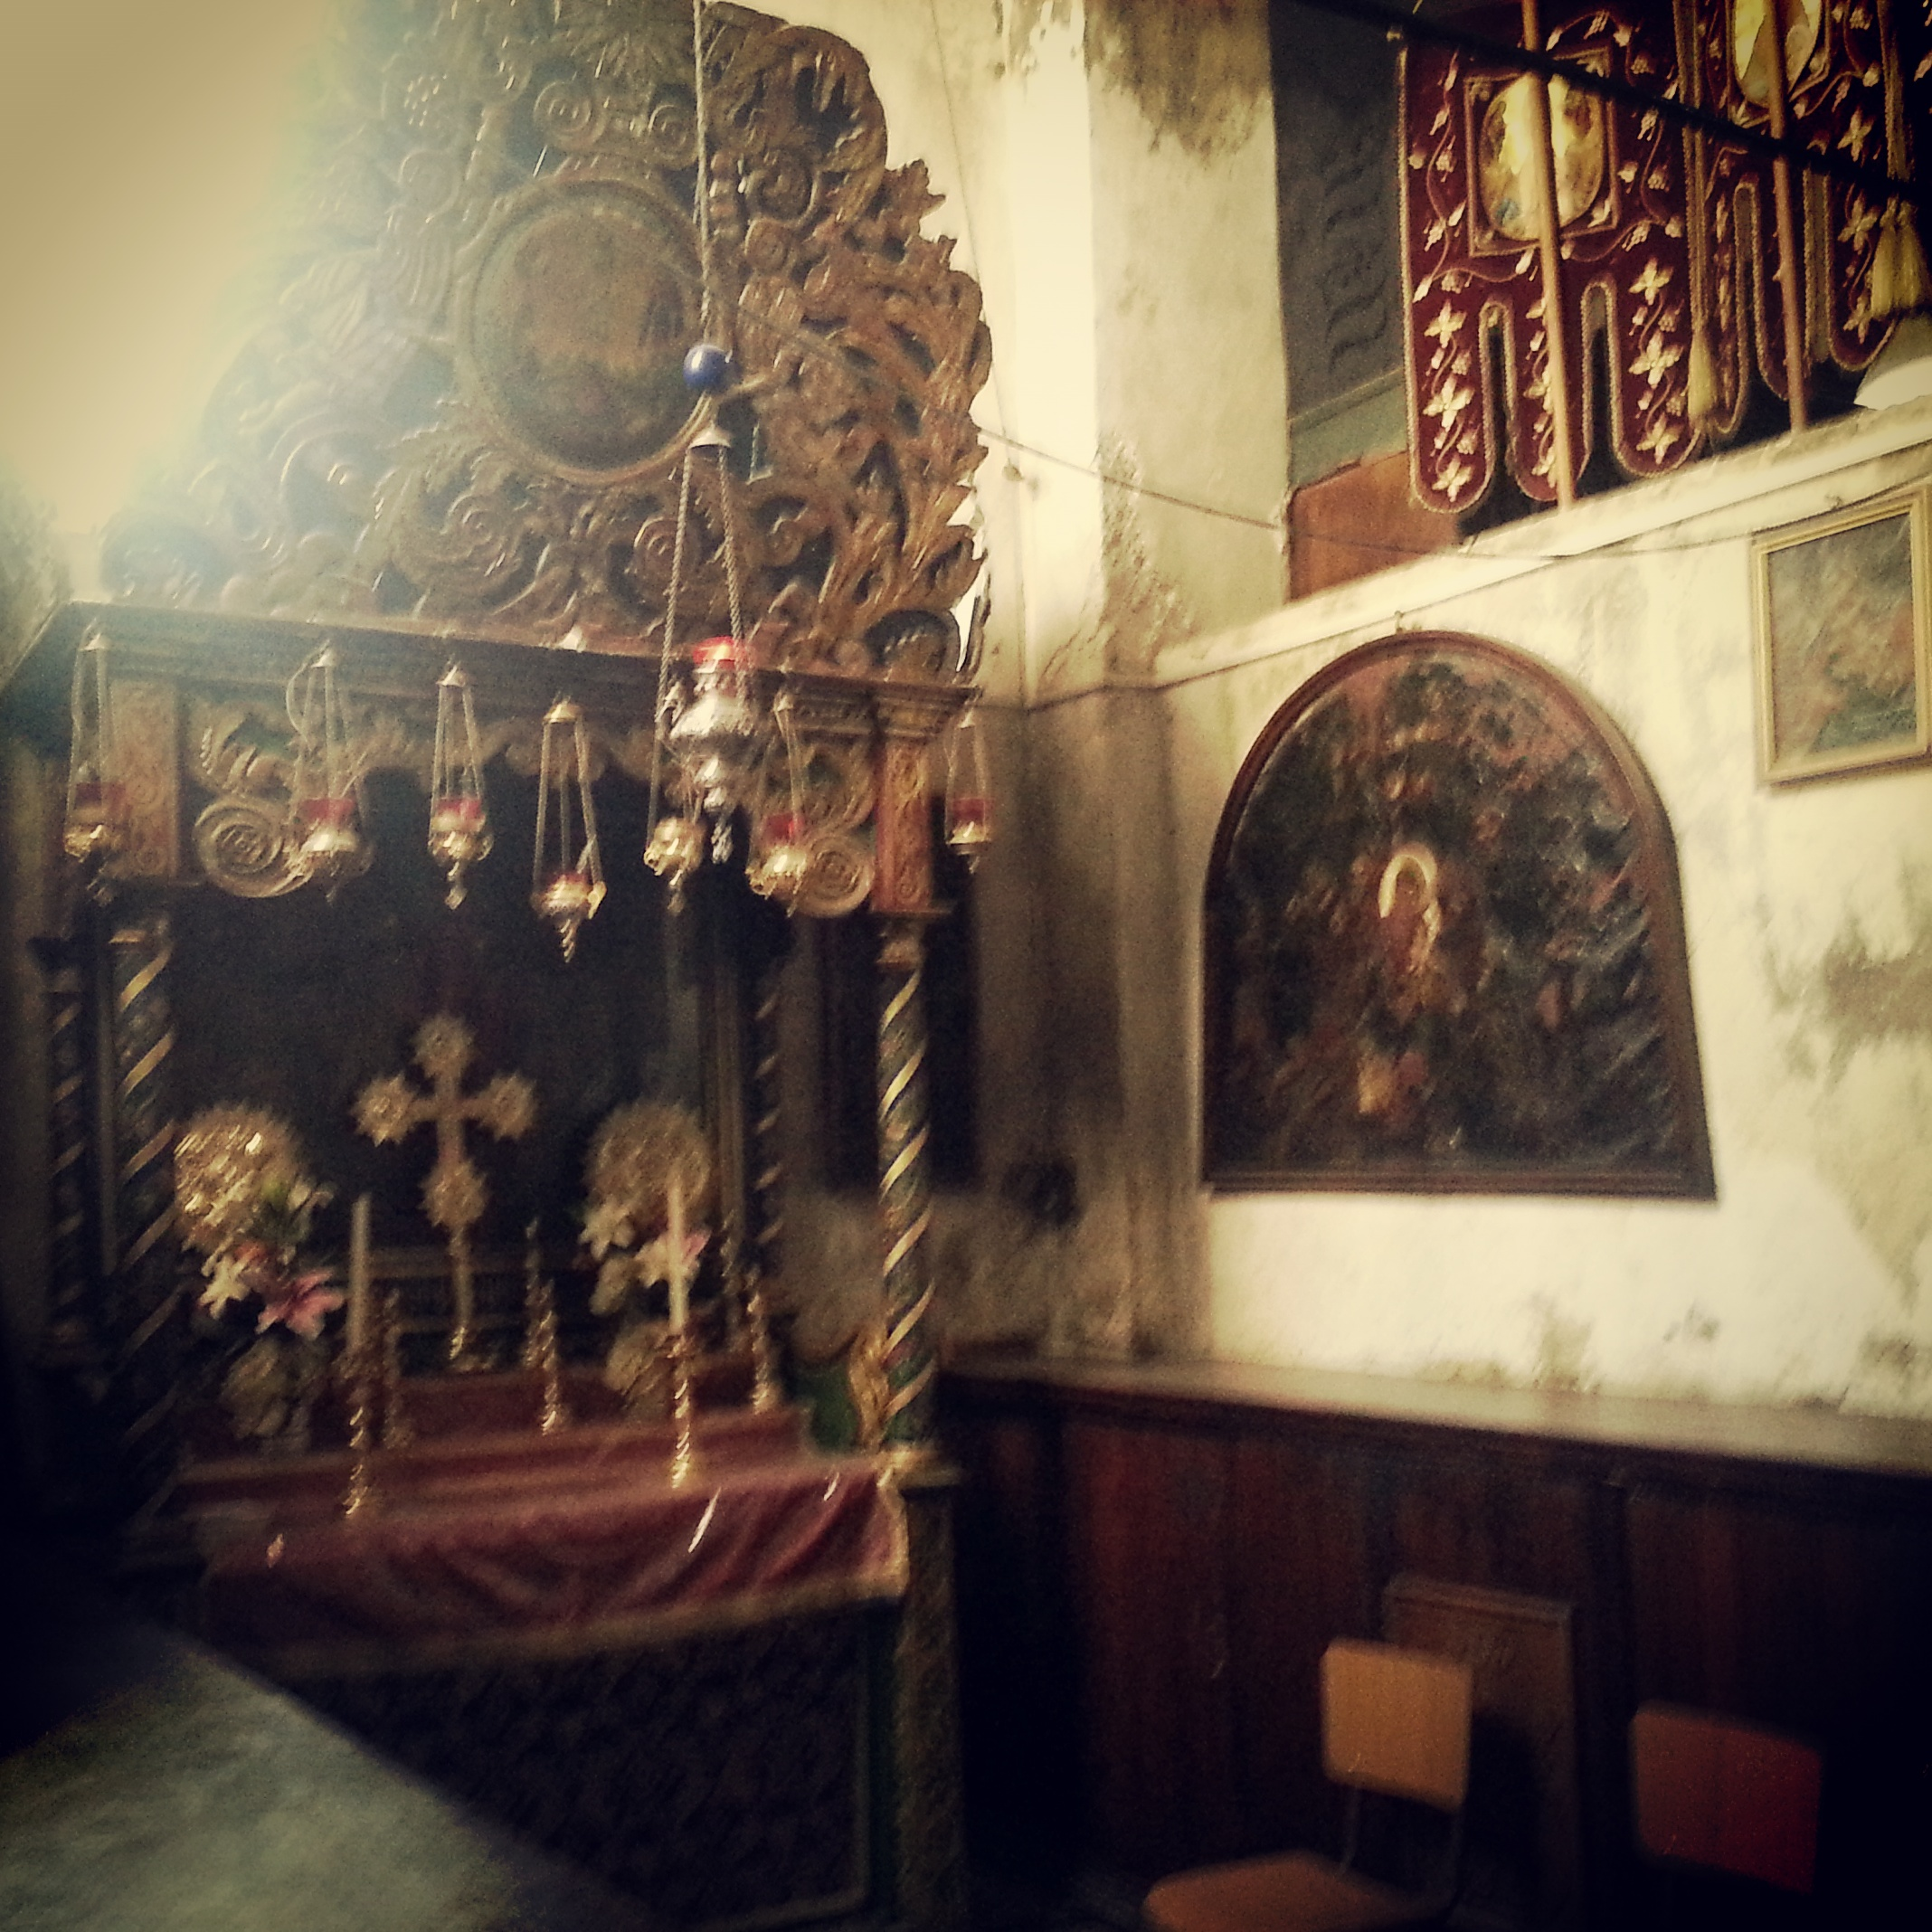 Armenian chapel in the Church of the Nativity, Bethlehem